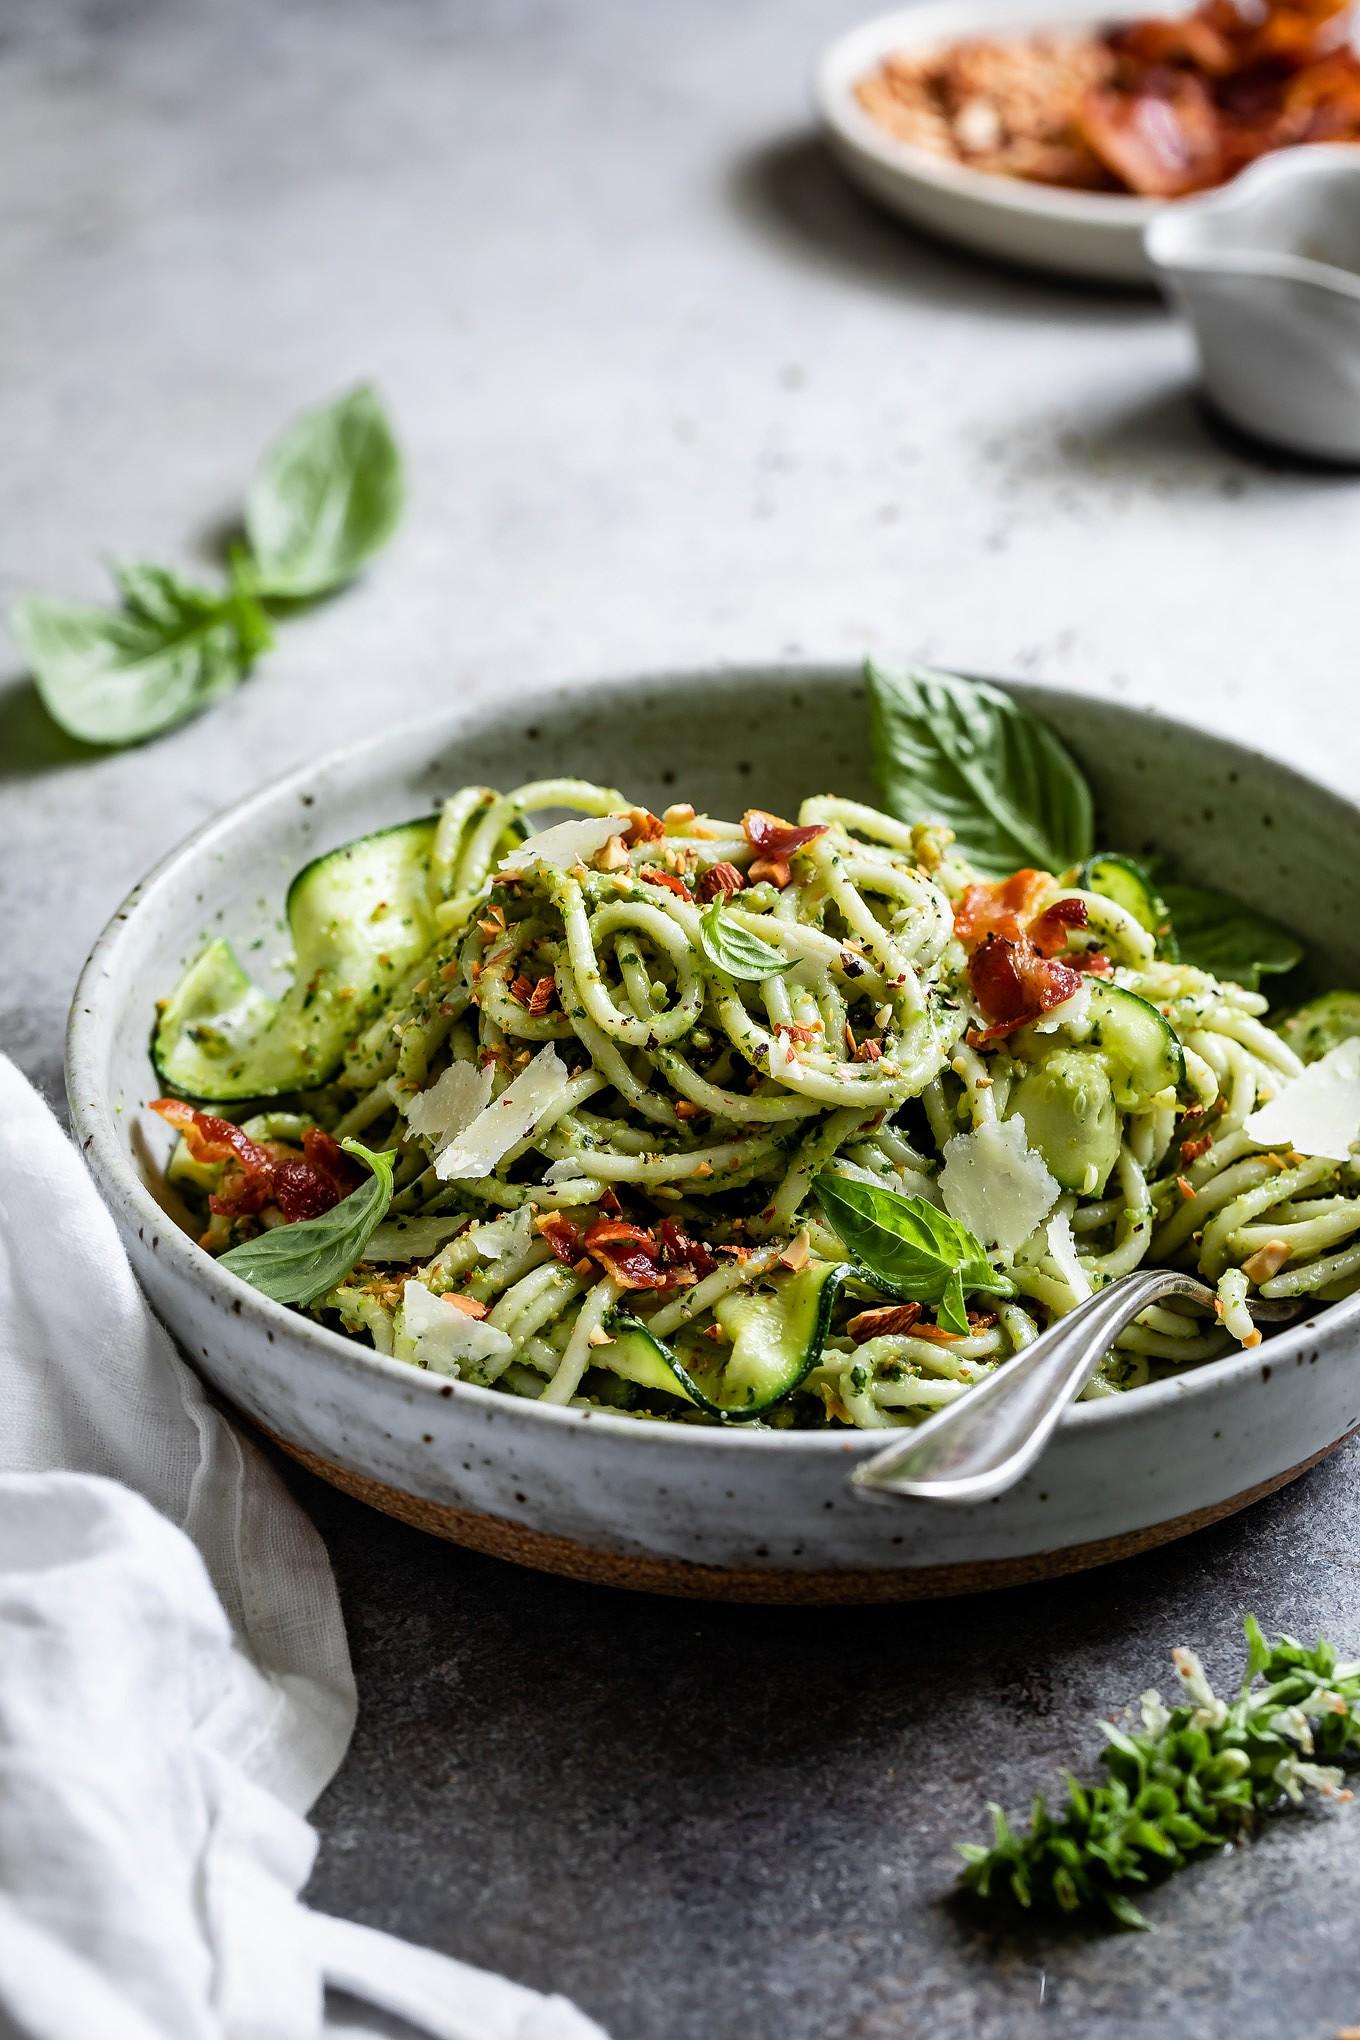 Zucchini-Pesto-Pasta-Roasted-Almonds-6.jpg